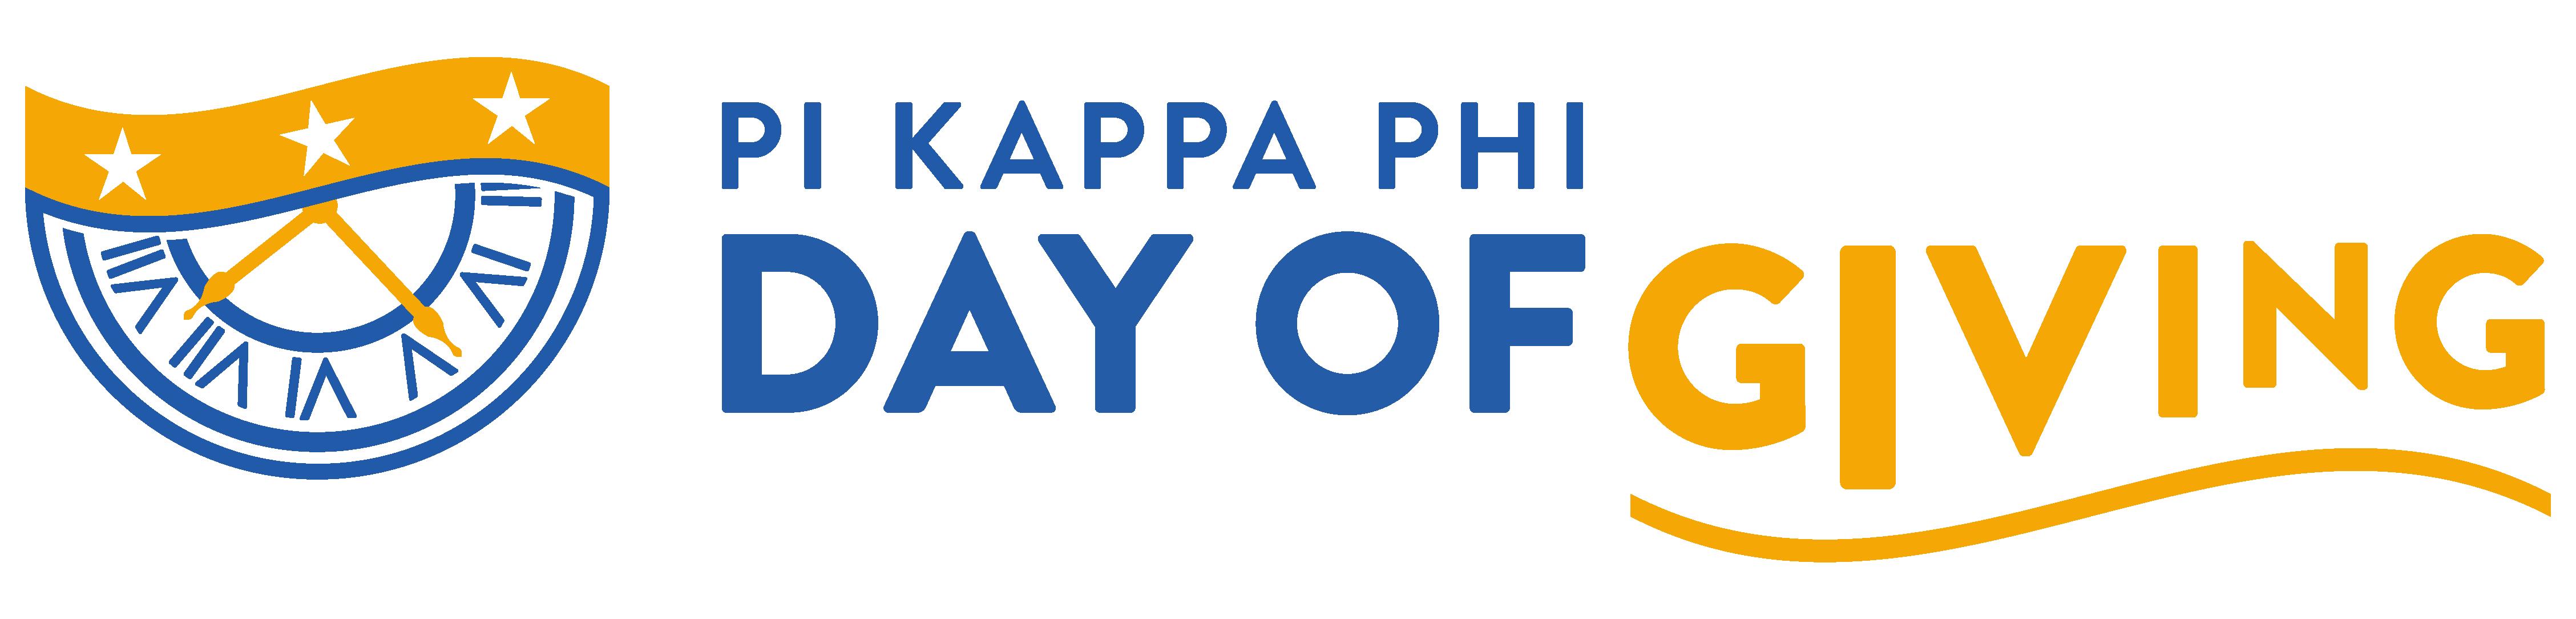 Pi Kappa Phi Foundation